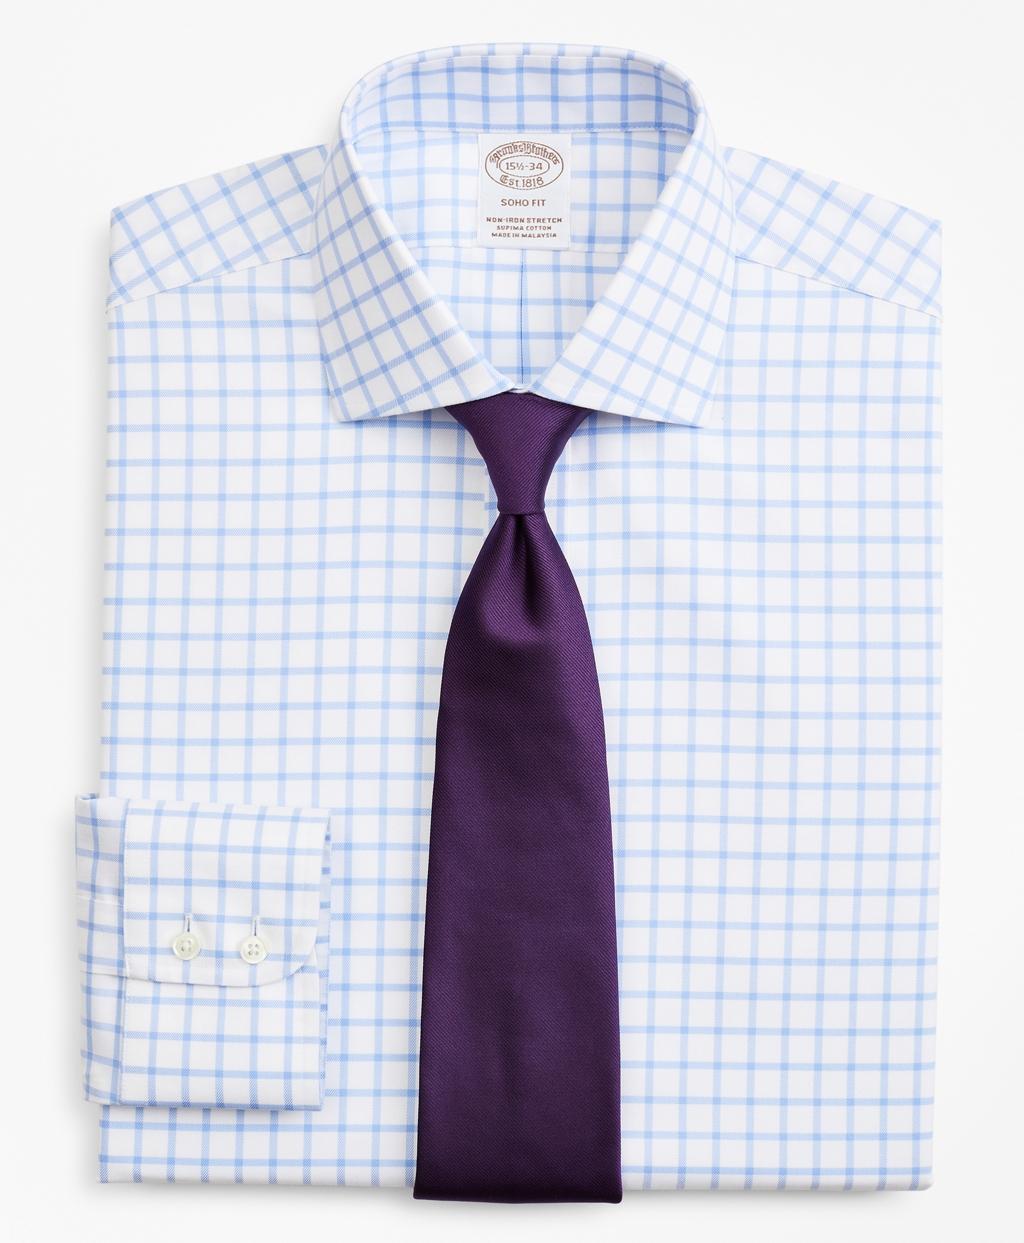 Brooksbrothers Stretch Soho Extra-Slim-Fit Dress Shirt, Non-Iron Twill English Collar Grid Check